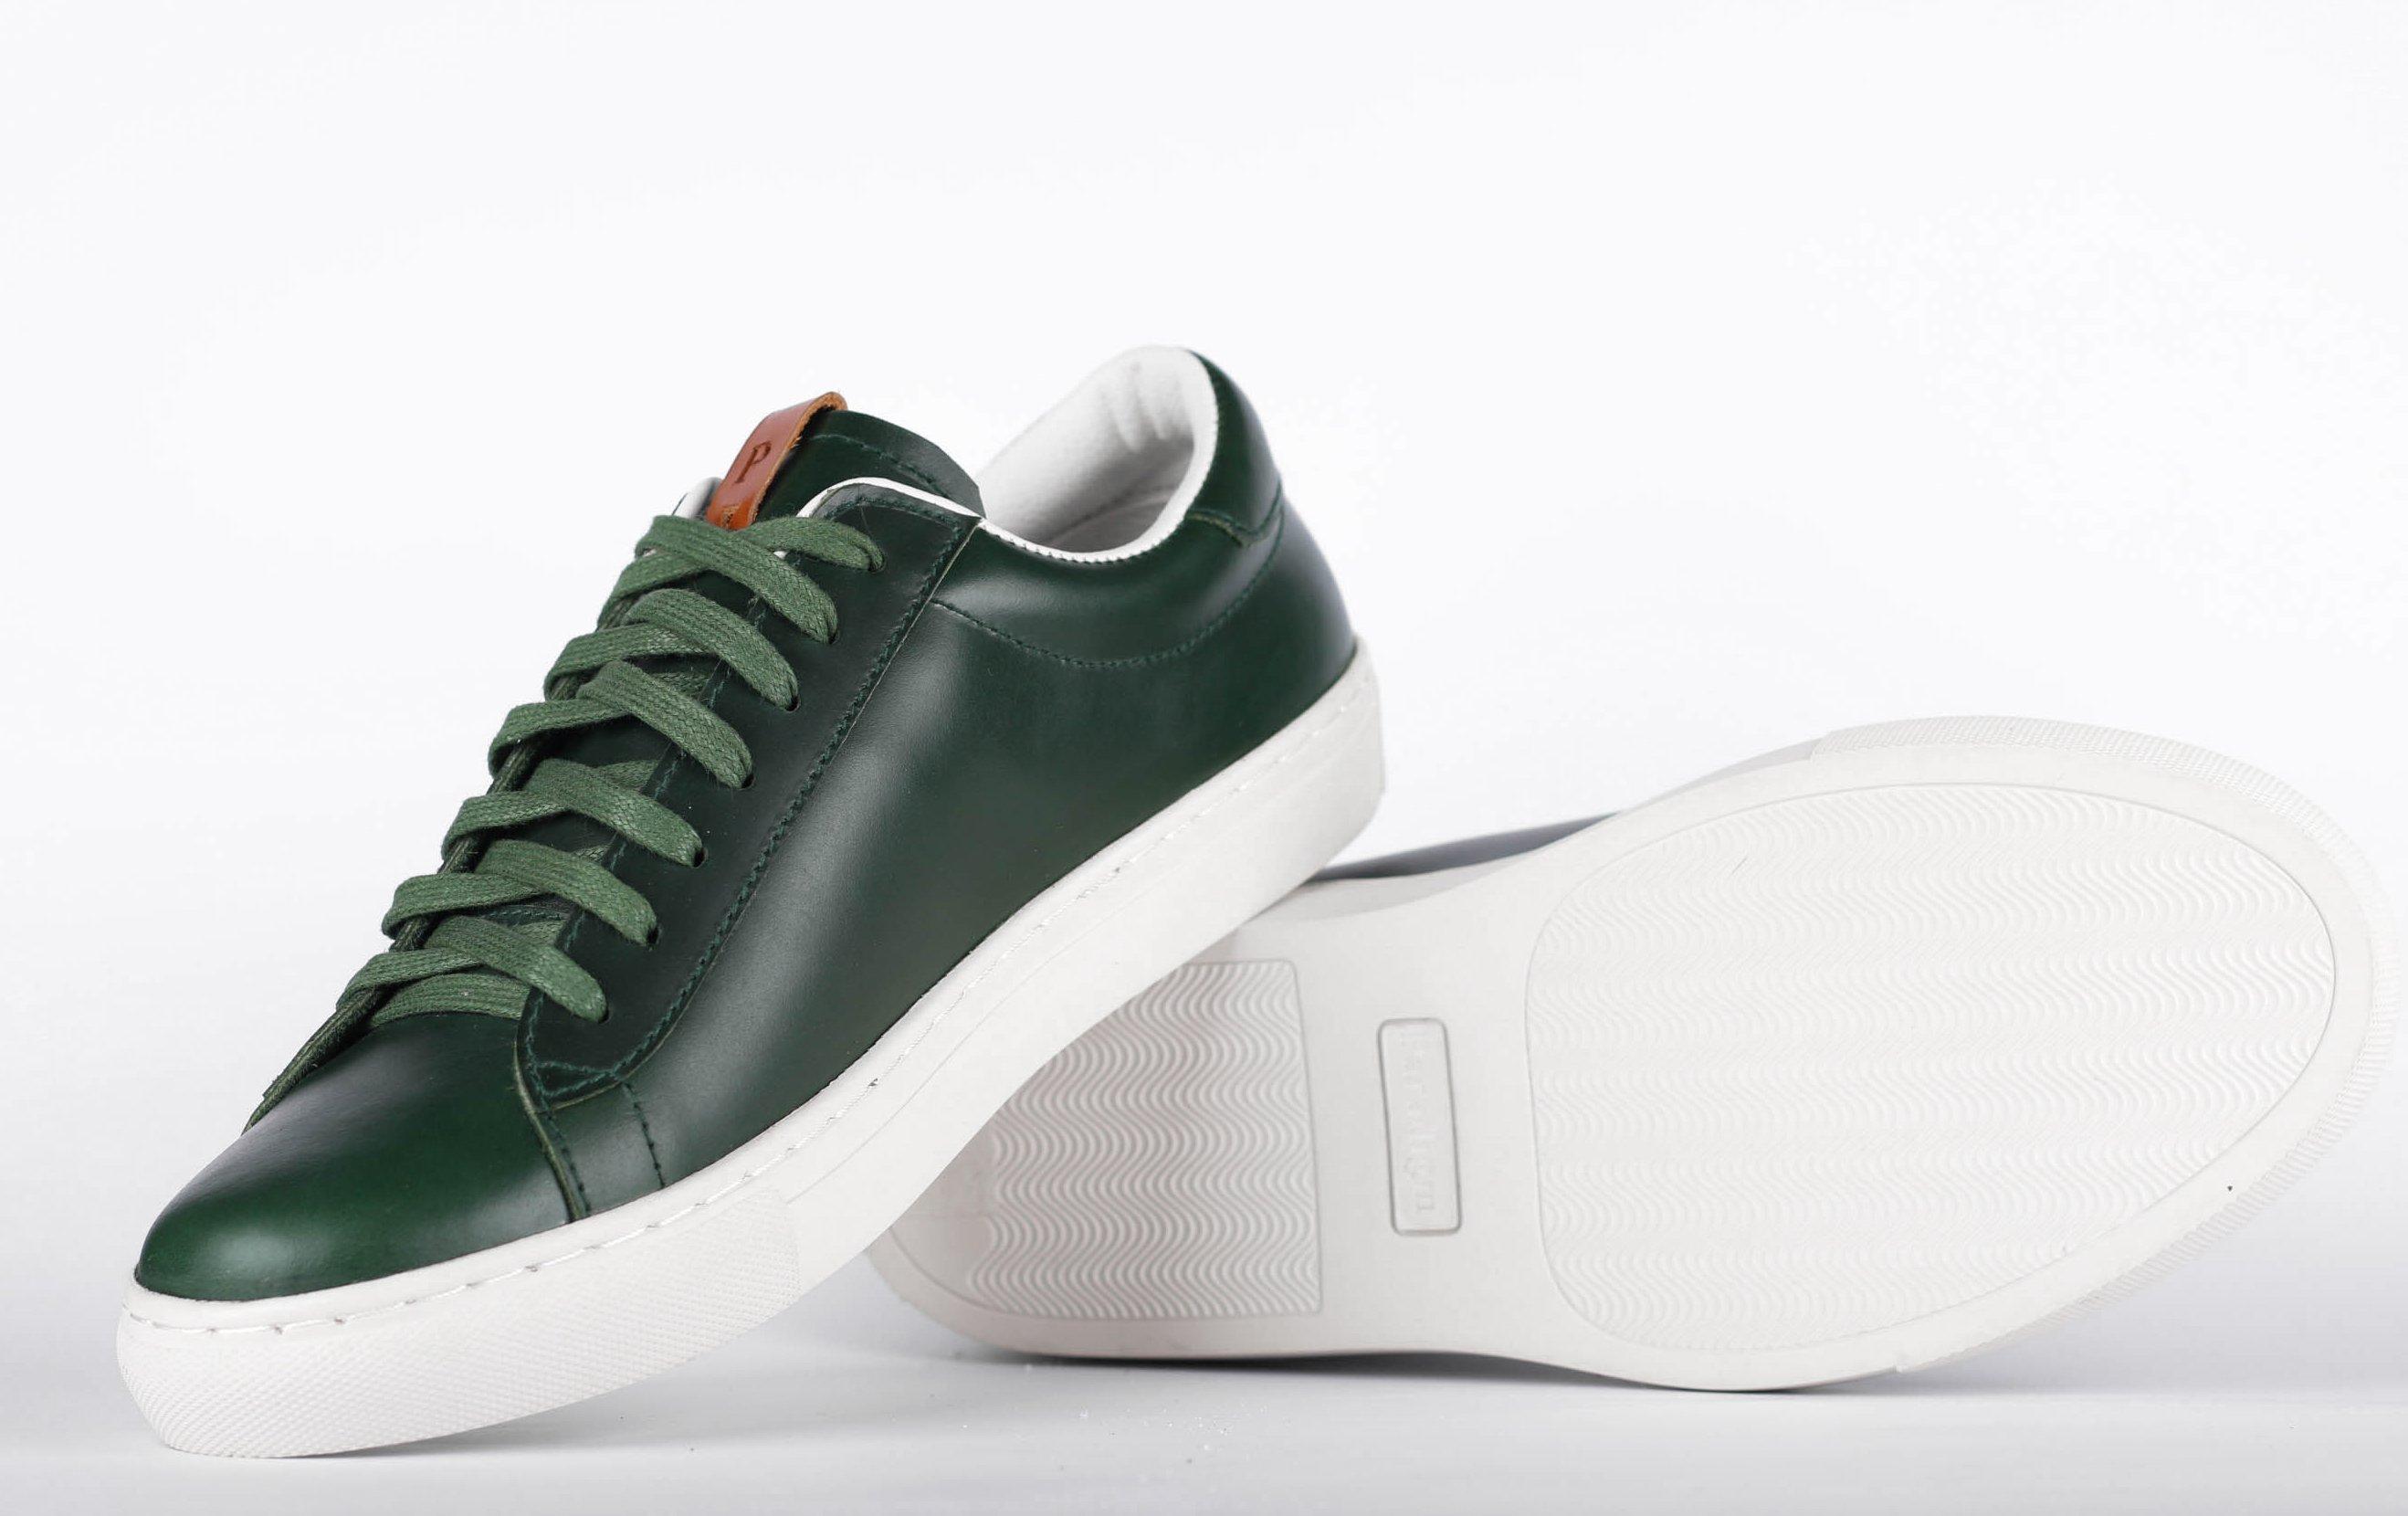 outlet store sale 8b369 01da0 Details zu Paradigm Shoes Herren Berlin Sneaker Italienisch Handgefertigte  Turnschuhe Grün